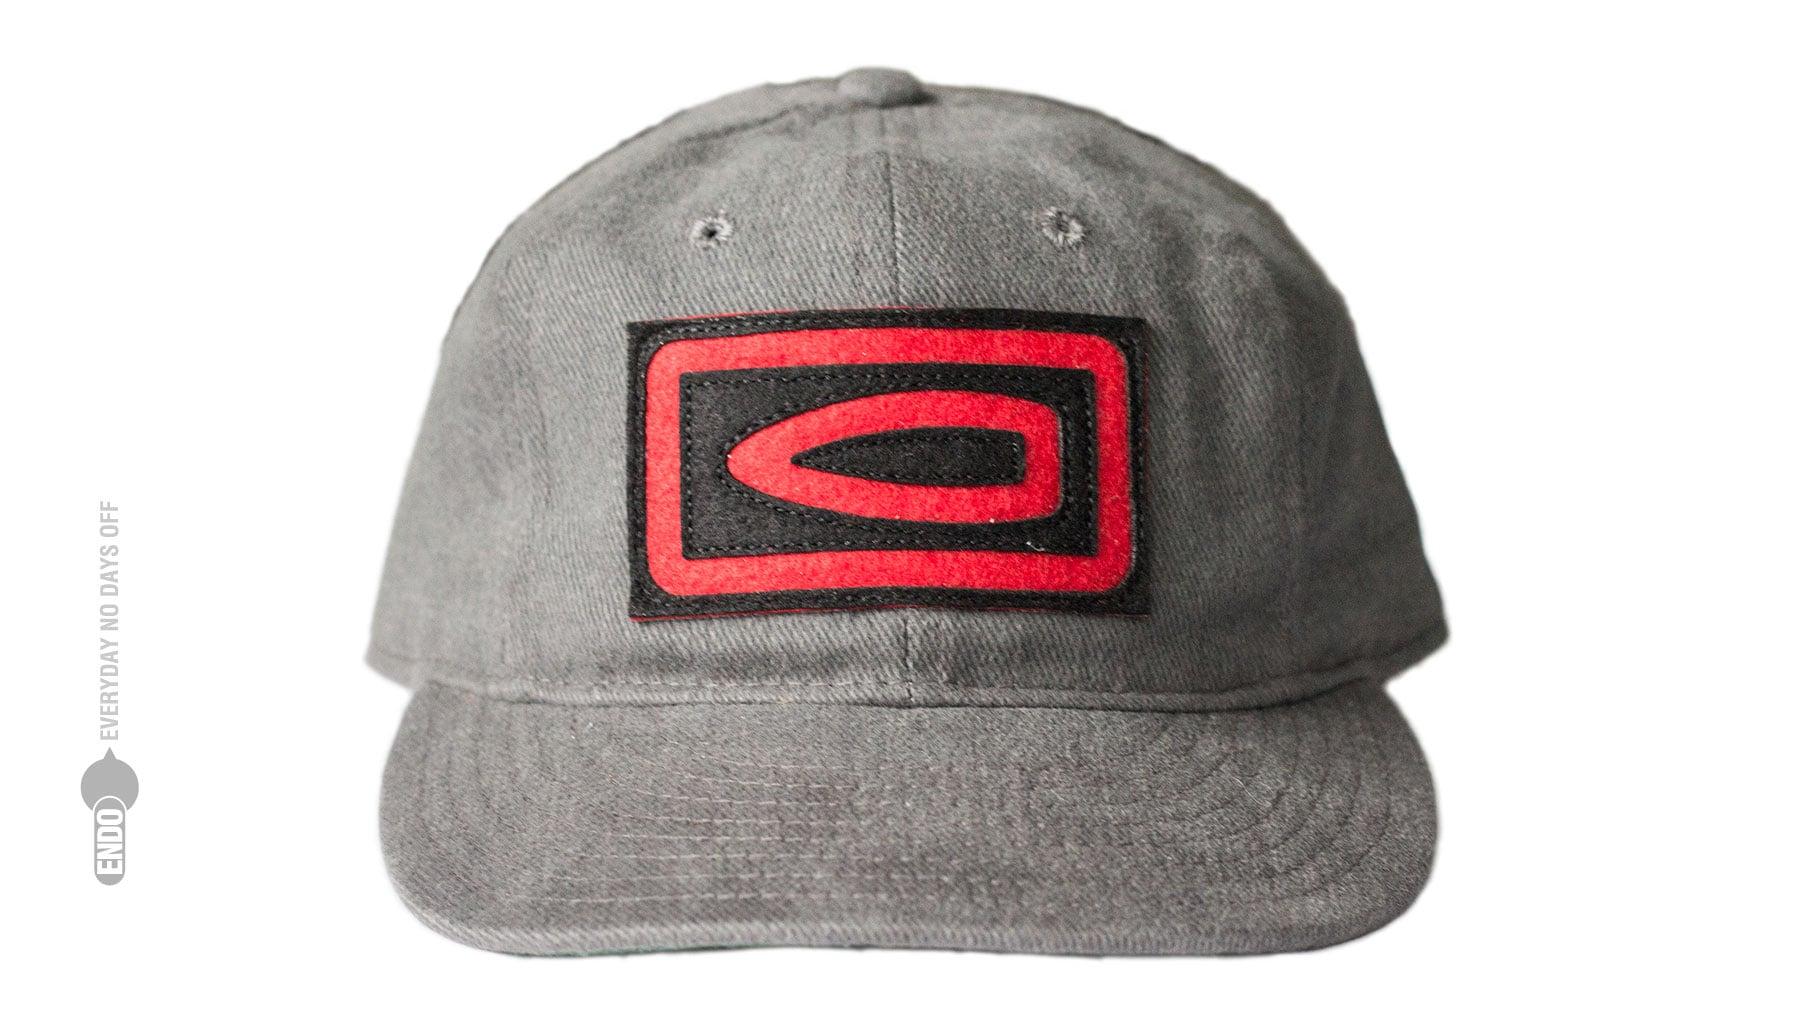 Semi-Auto-Pictogram-Grey-Twill-Hat-Main